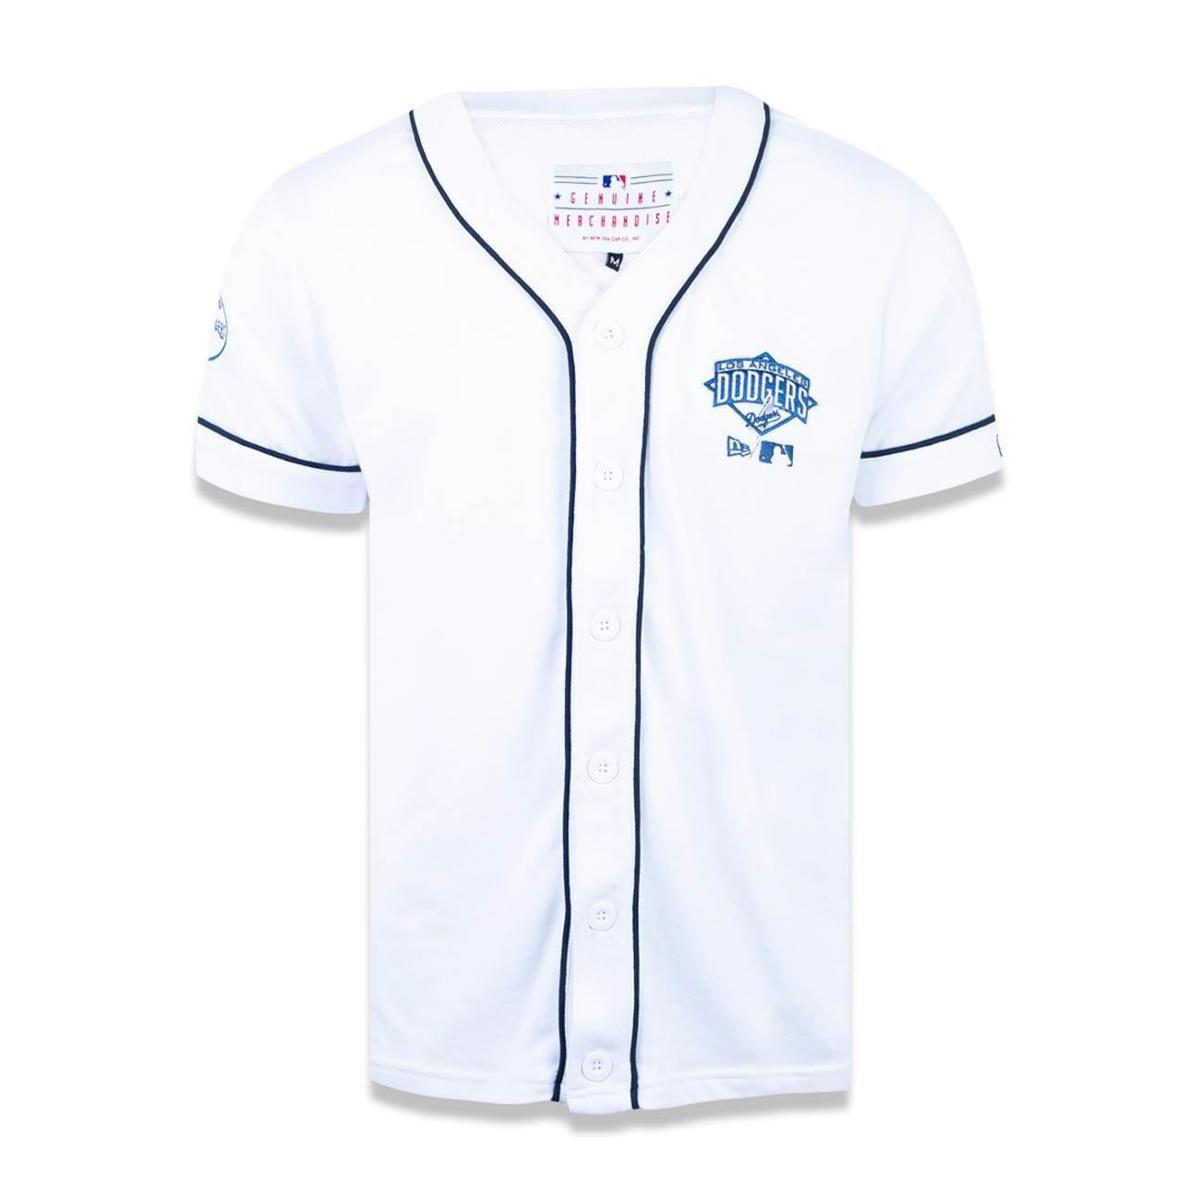 2850a46fd Camisa Los Angeles Dodgers MLB New Era Masculina - Branco - Compre Agora